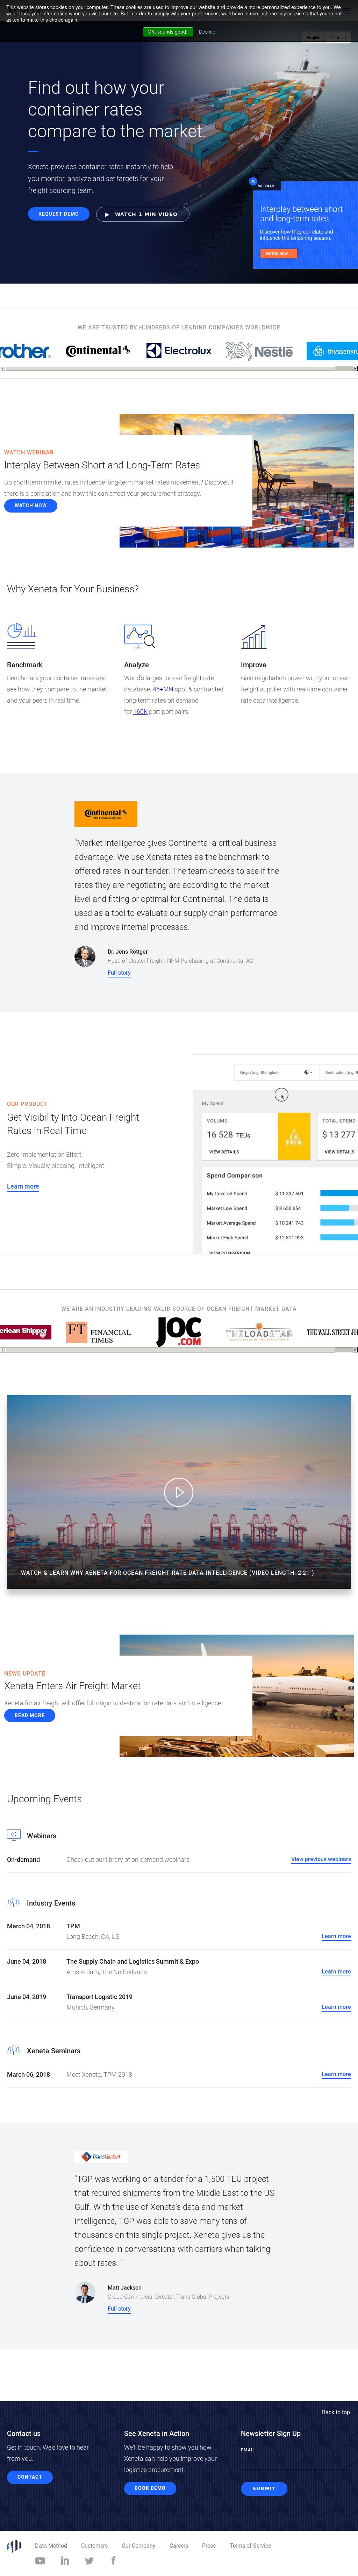 Xeneta Competitors, Revenue and Employees - Owler Company Profile